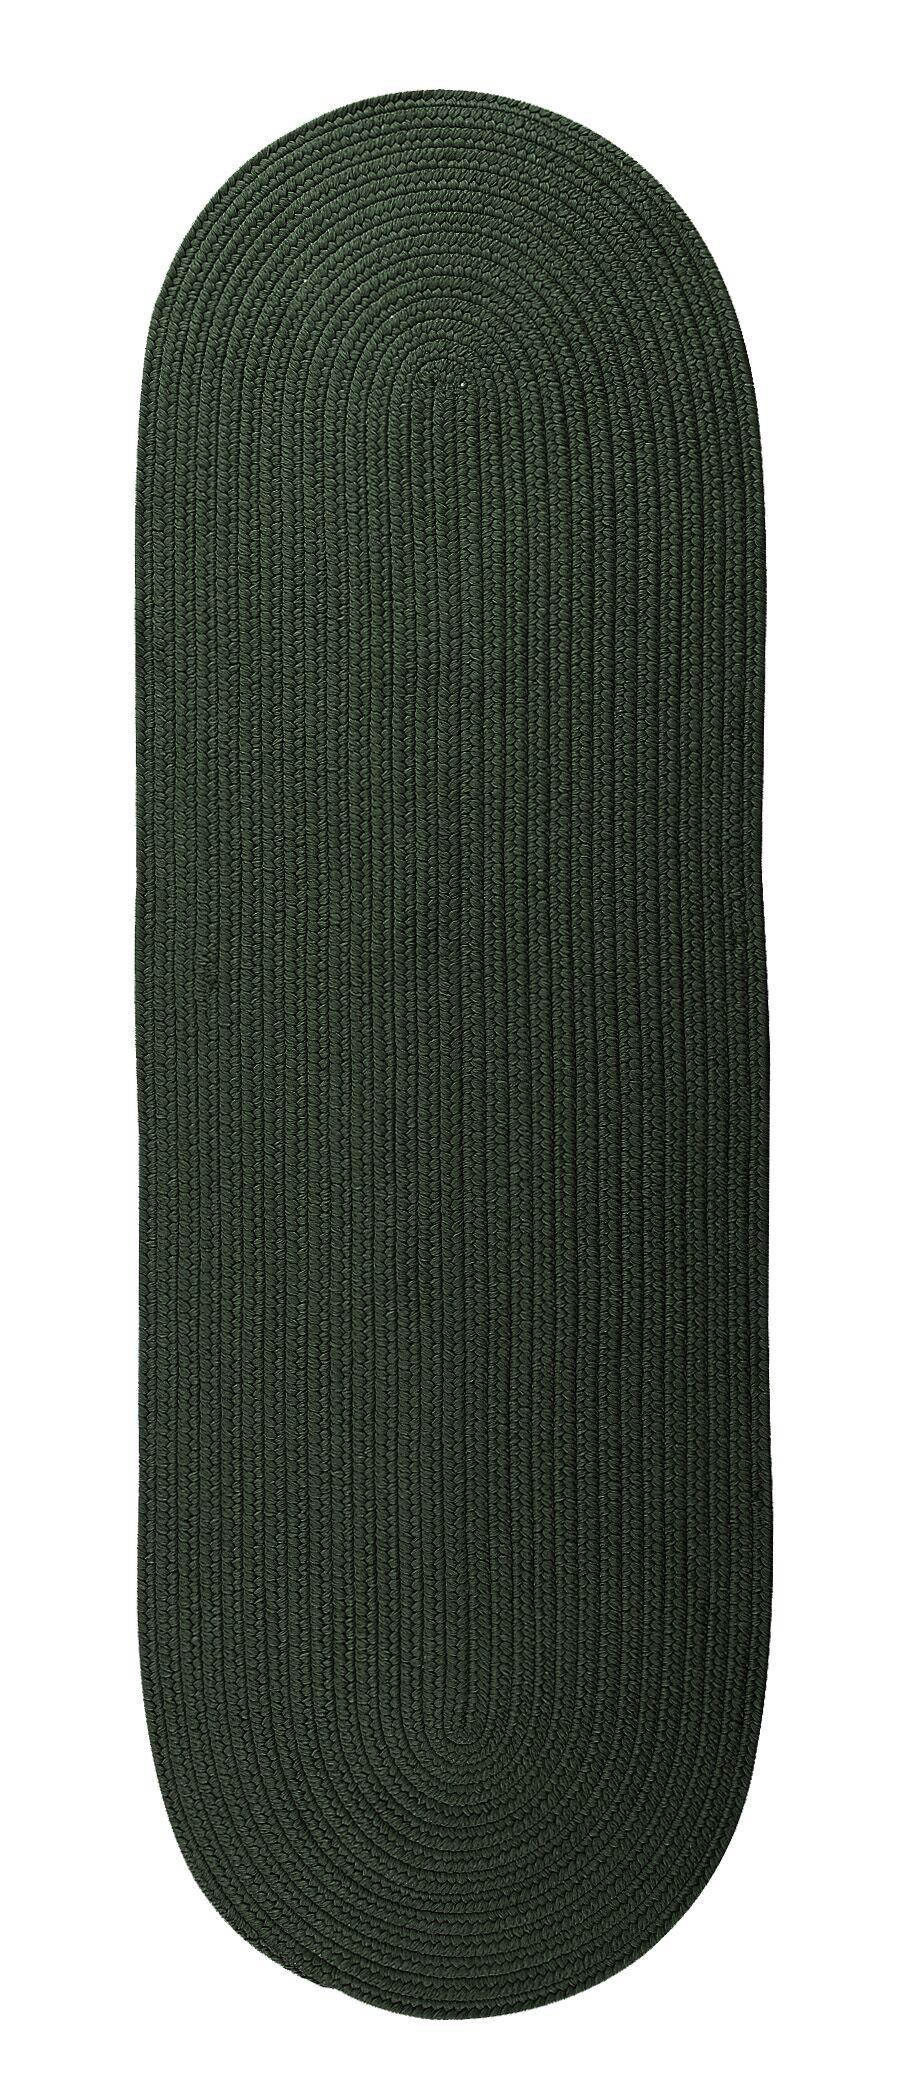 Mcintyre Dark Green Outdoor Area Rug Rug Size: Oval Runner 2' x 6'